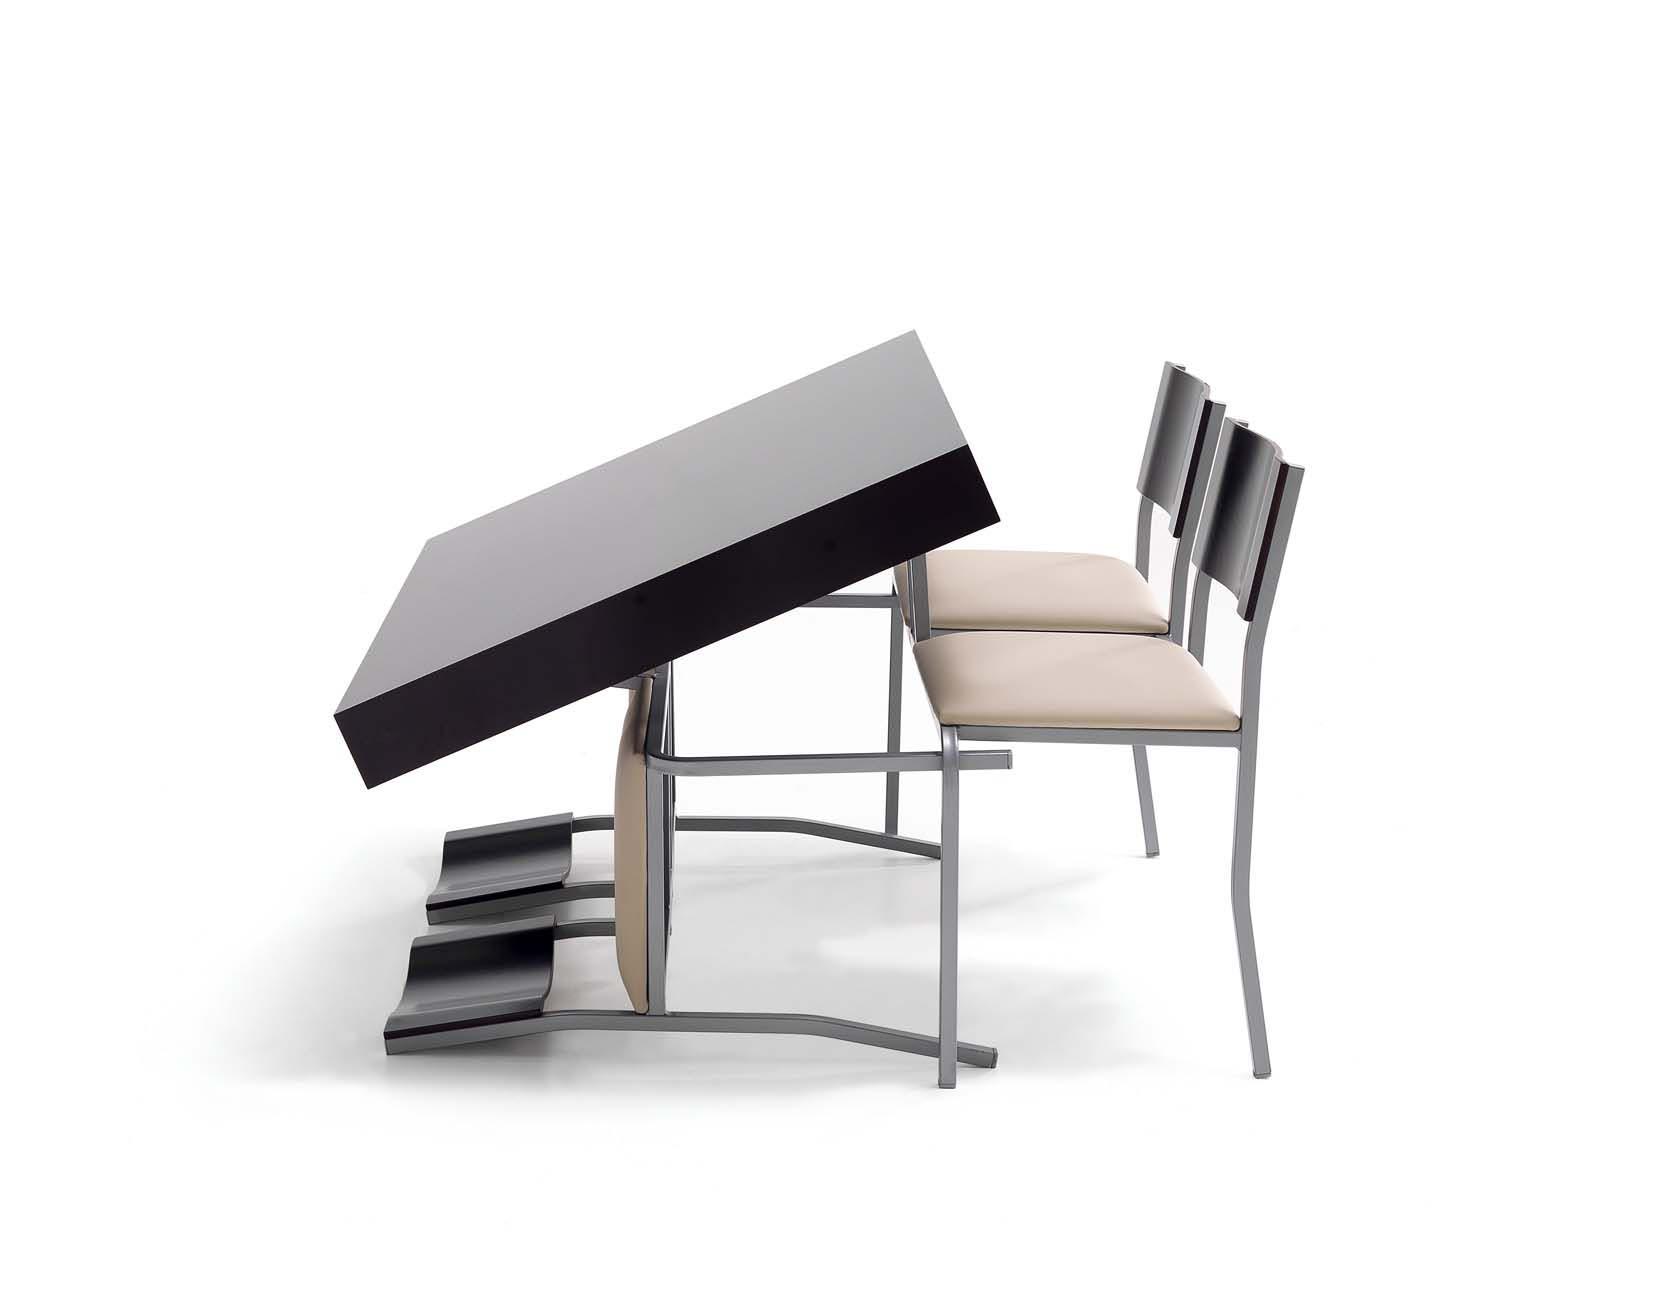 Fidic mesa de centro elevable con las 4 sillas incorporadas for Mesa comedor transformable